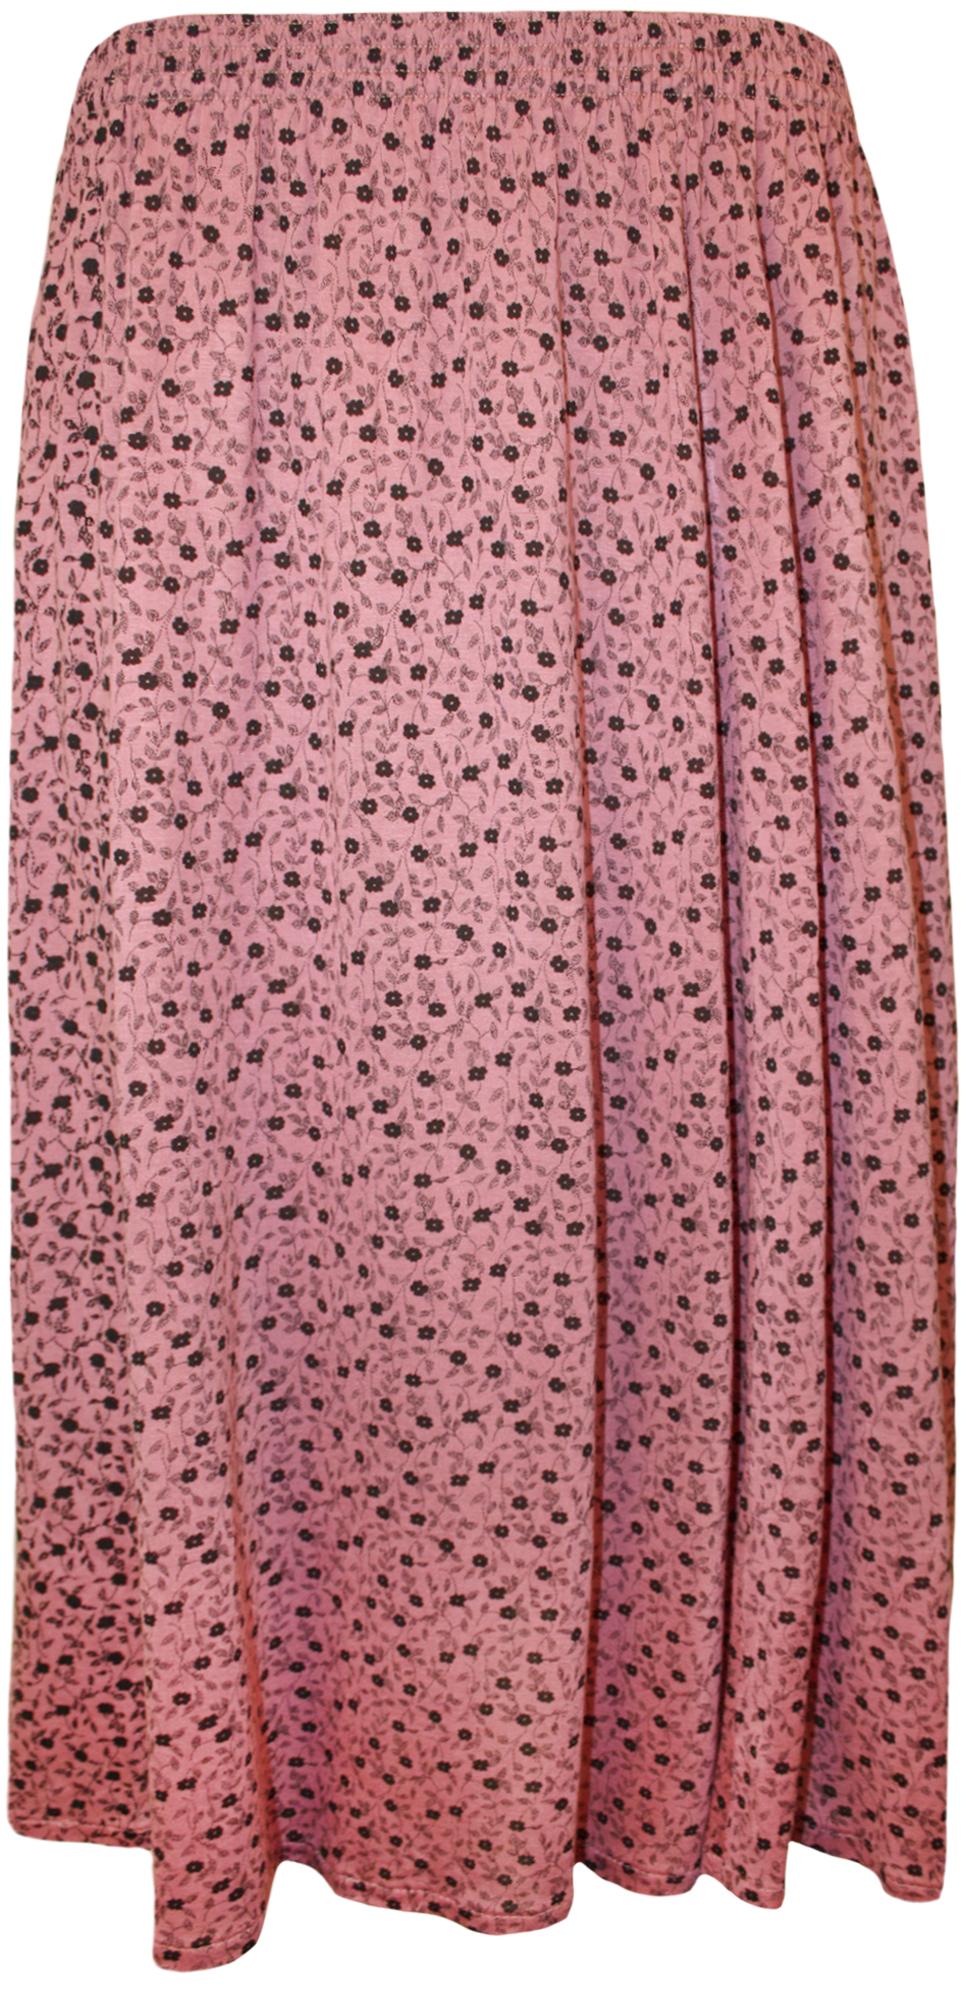 New-Plus-Size-Womens-Printed-Pattern-Elasticated-Waist-Ladies-Flared-Skirt-12-26